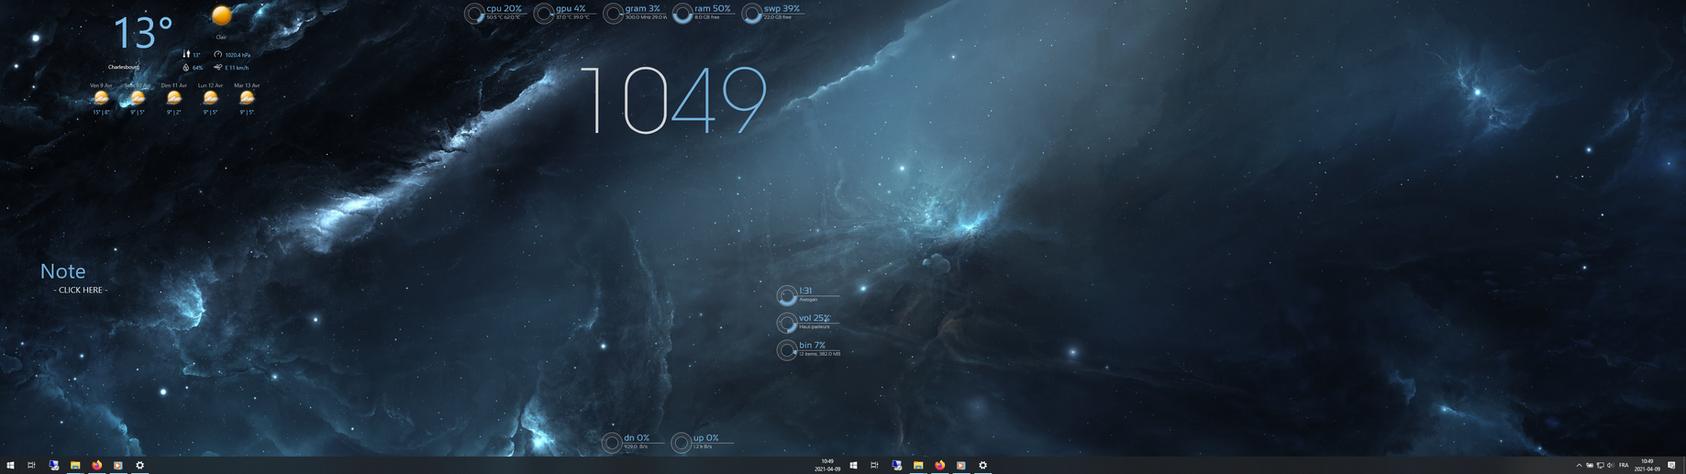 Def blue space HW 1.9 (HWInfo version)